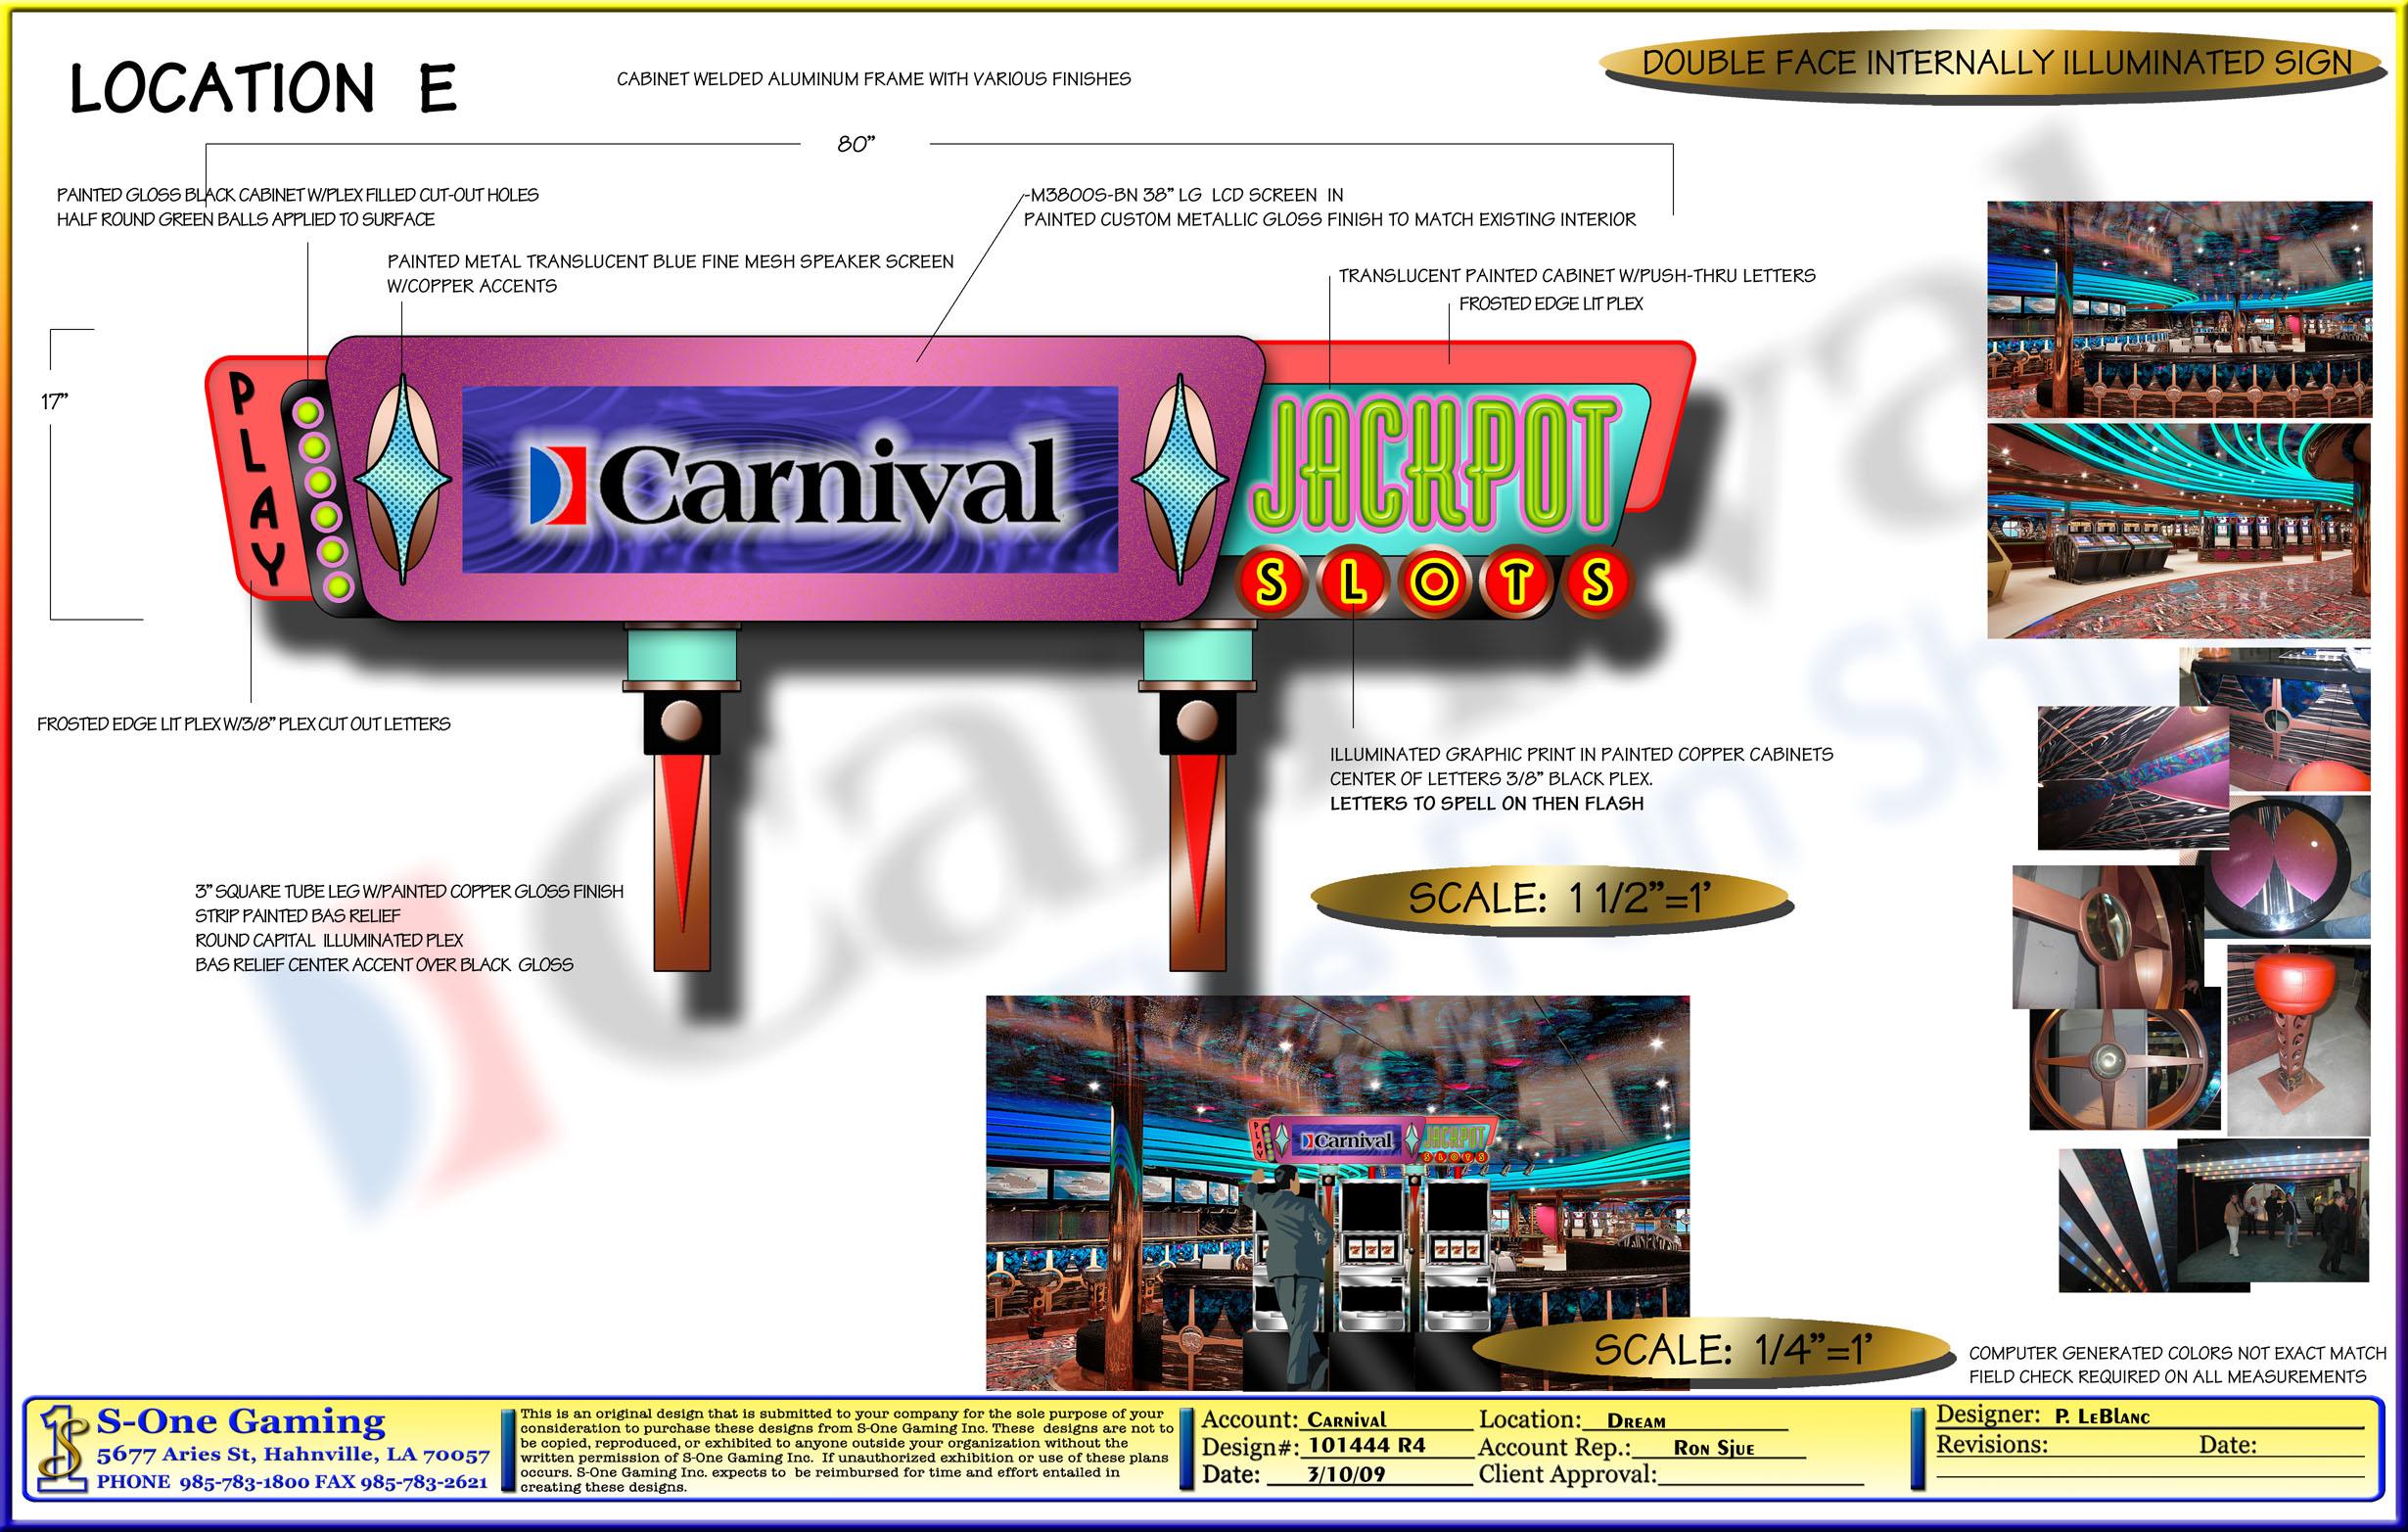 101444 R4 Carn DREAM Loc E 38in strech LCD.jpg